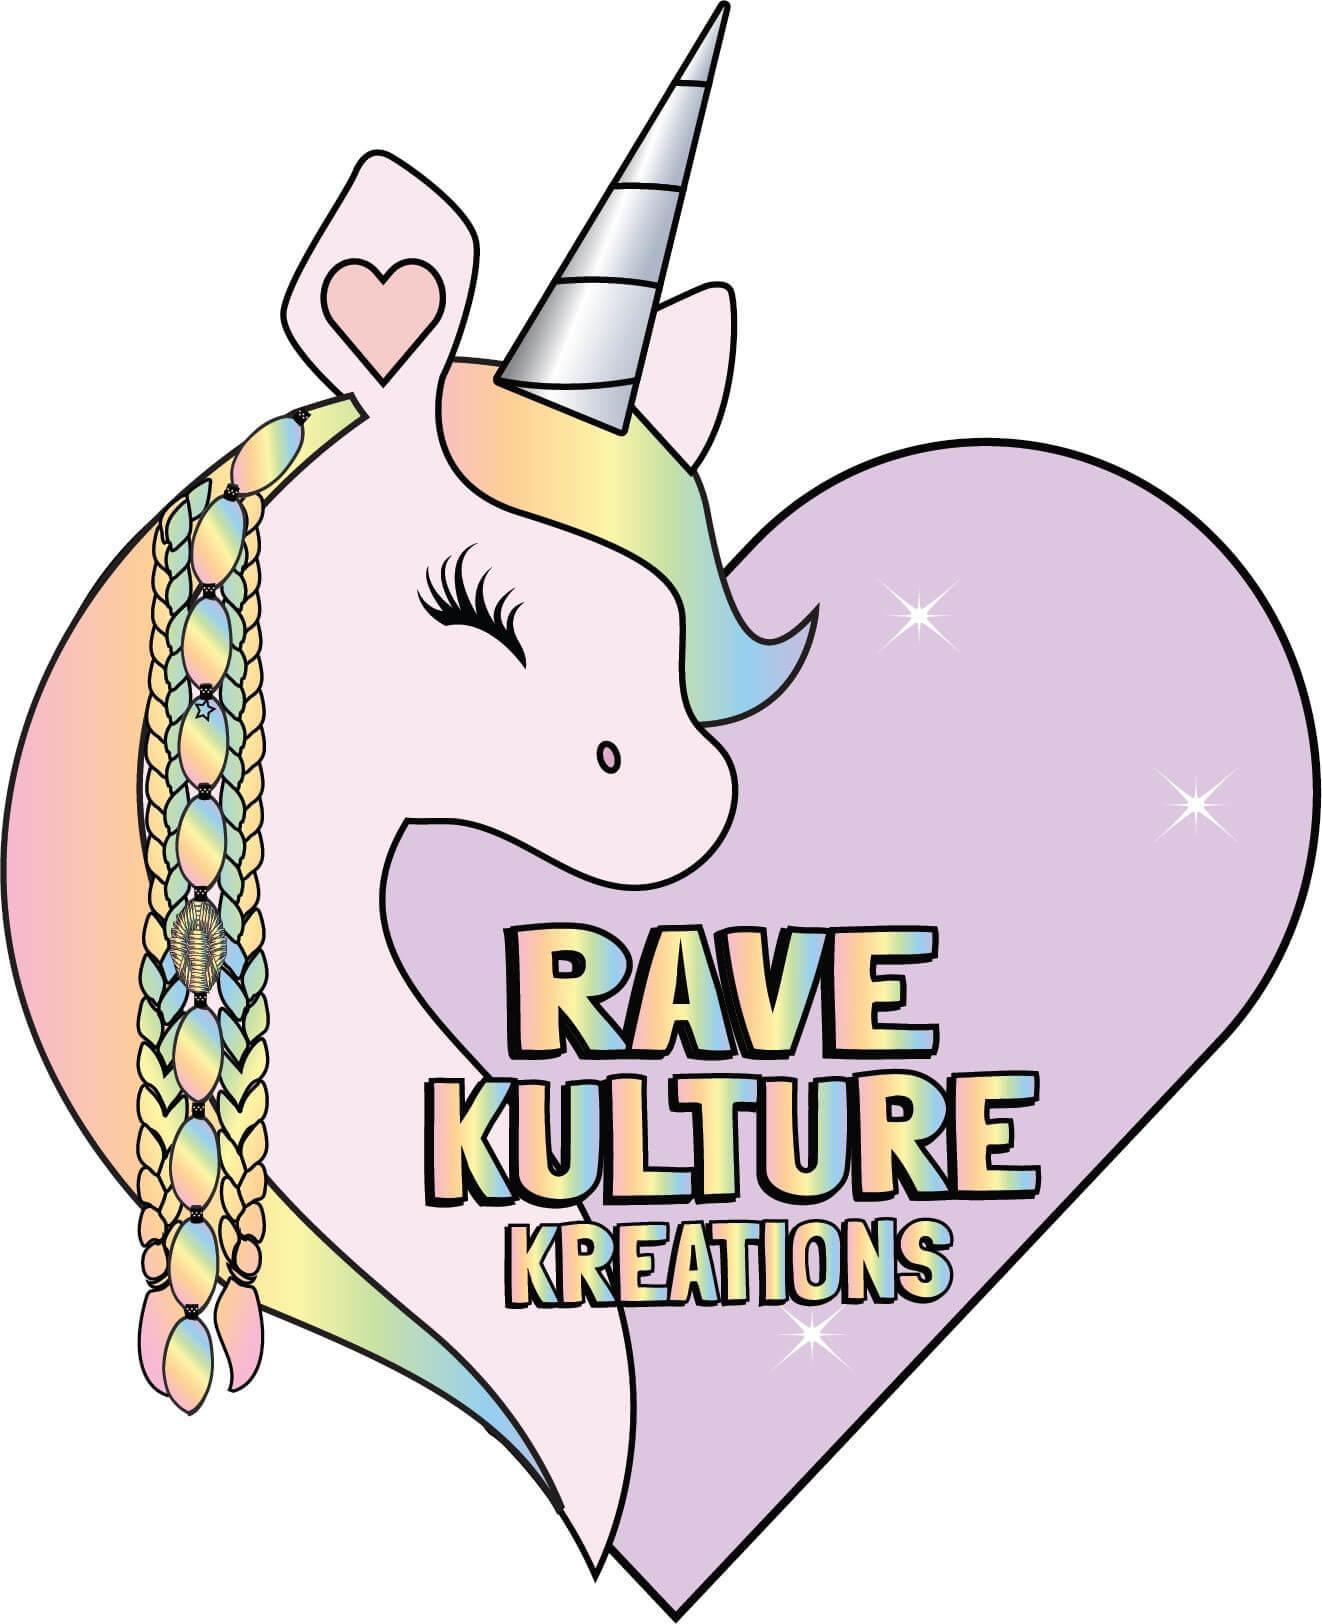 Rave Kulture Creations